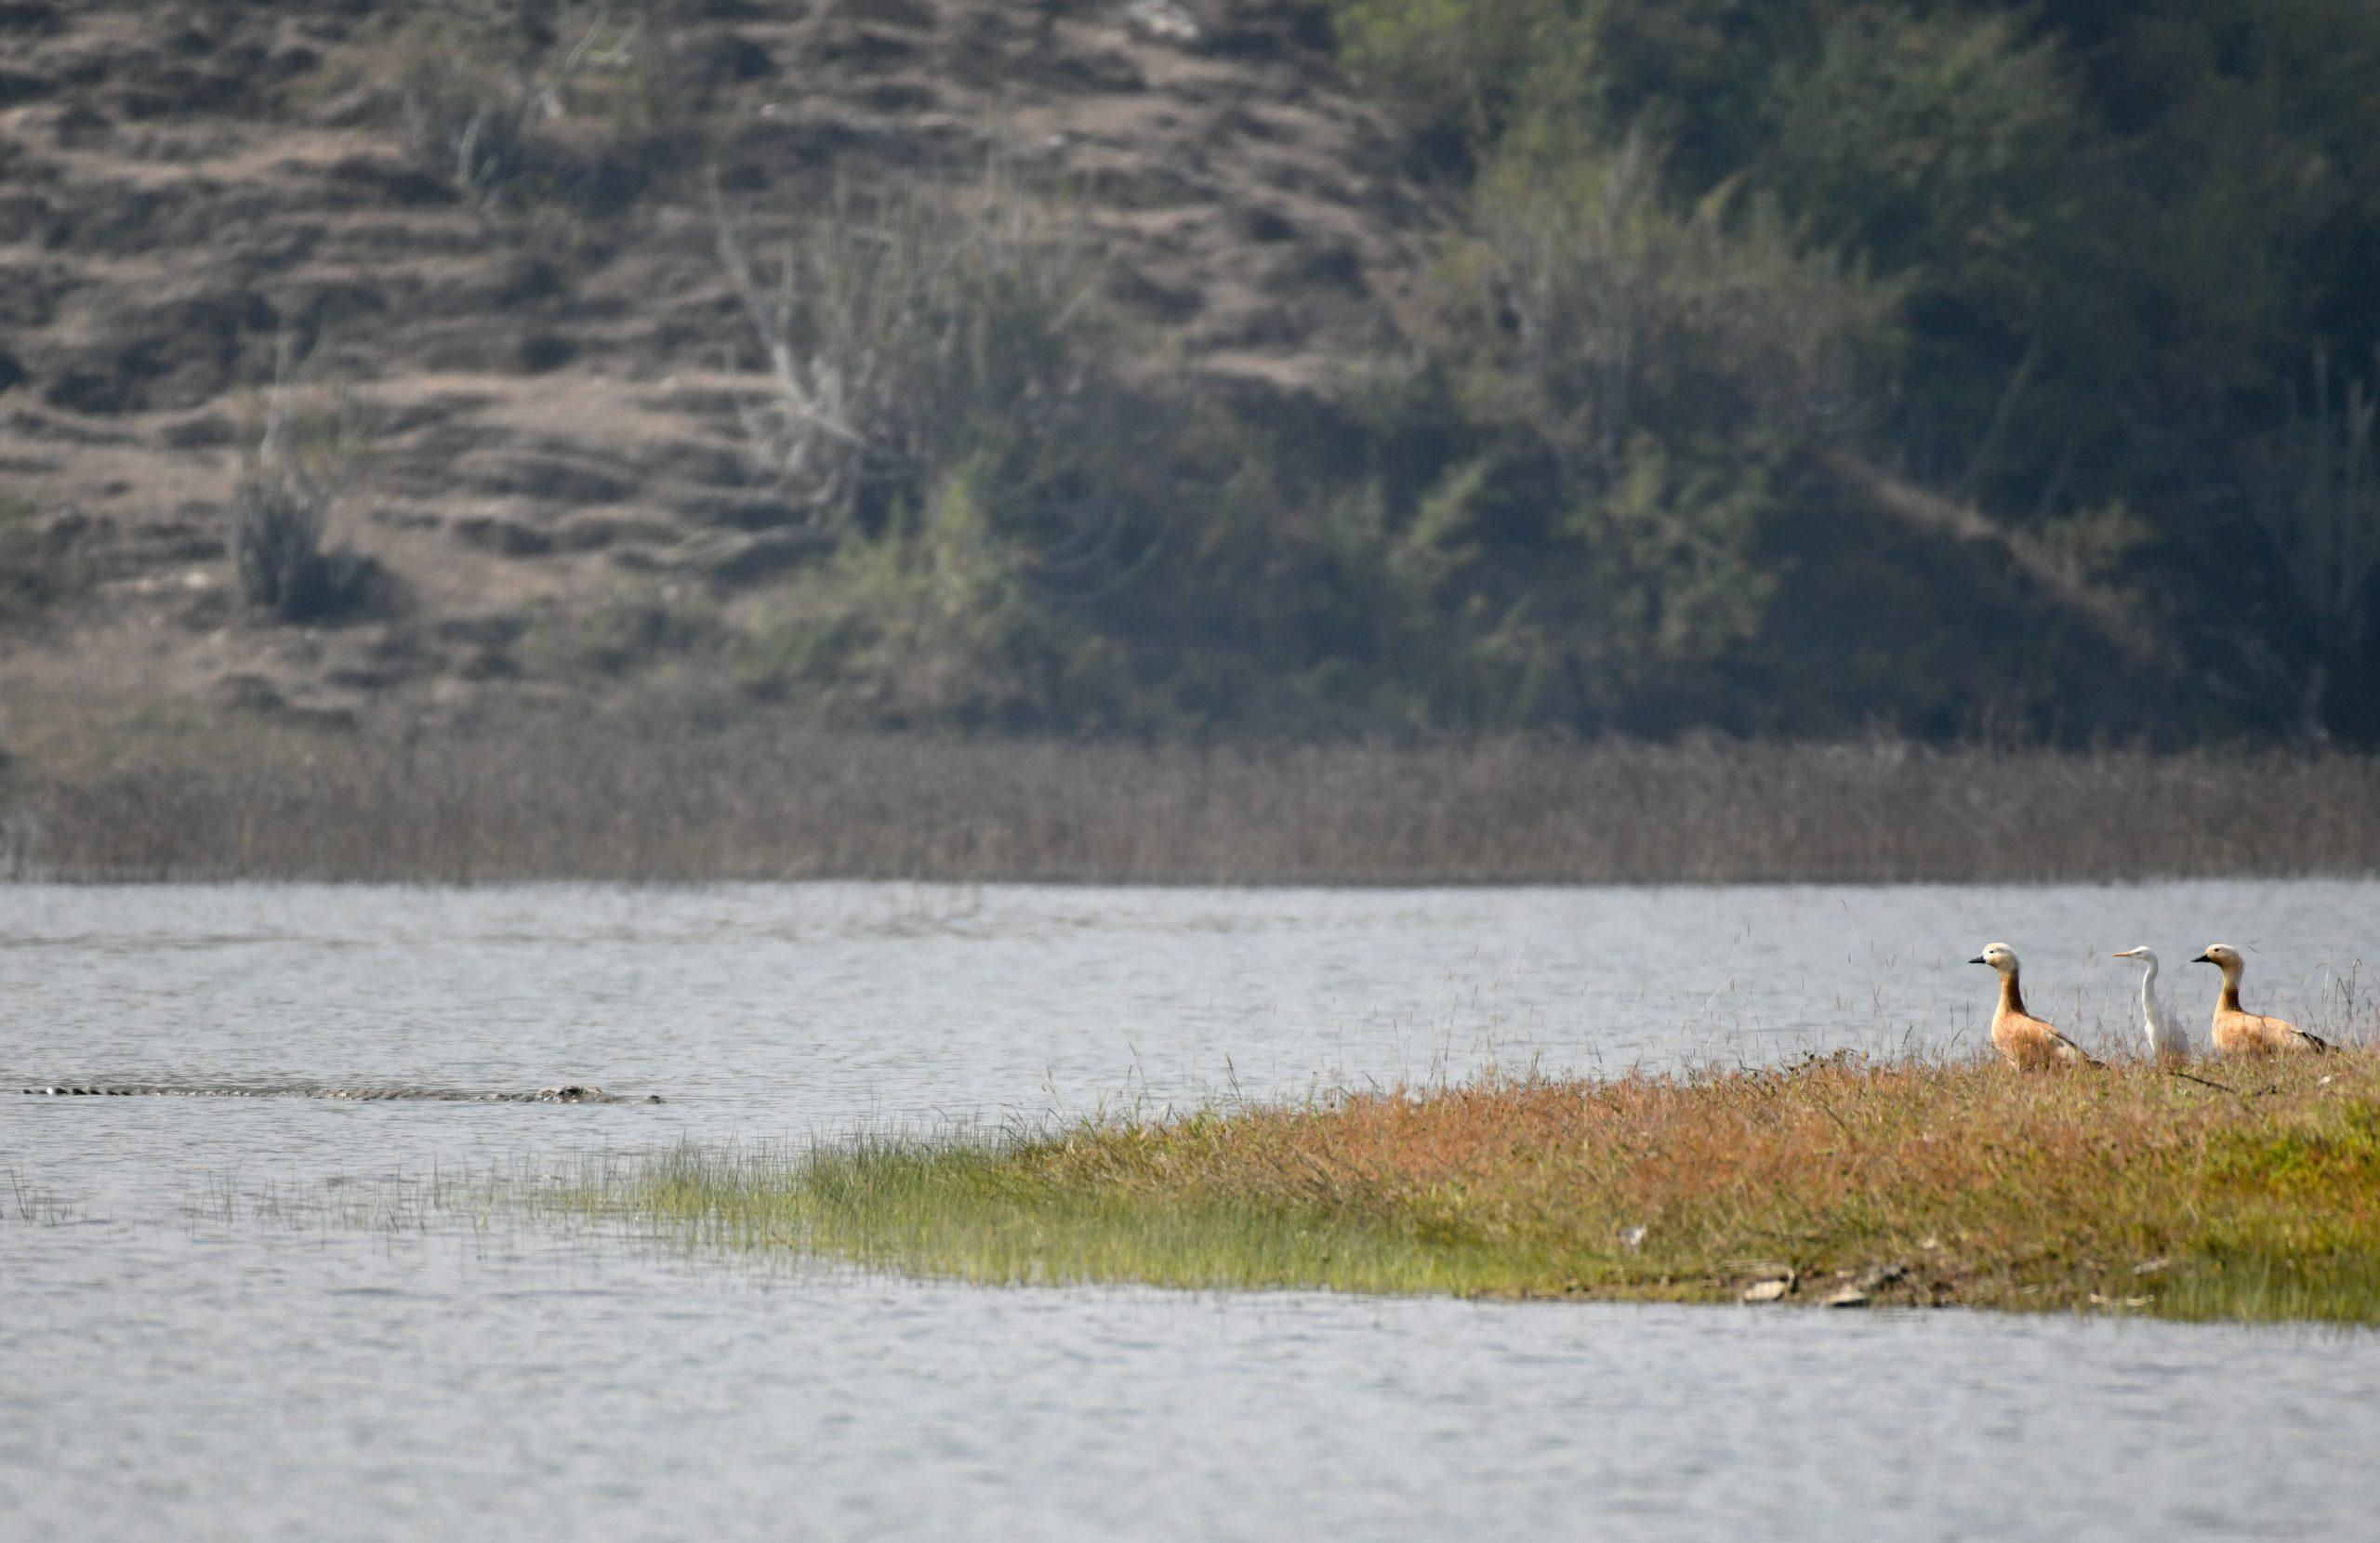 Crocodile hunting on ducks